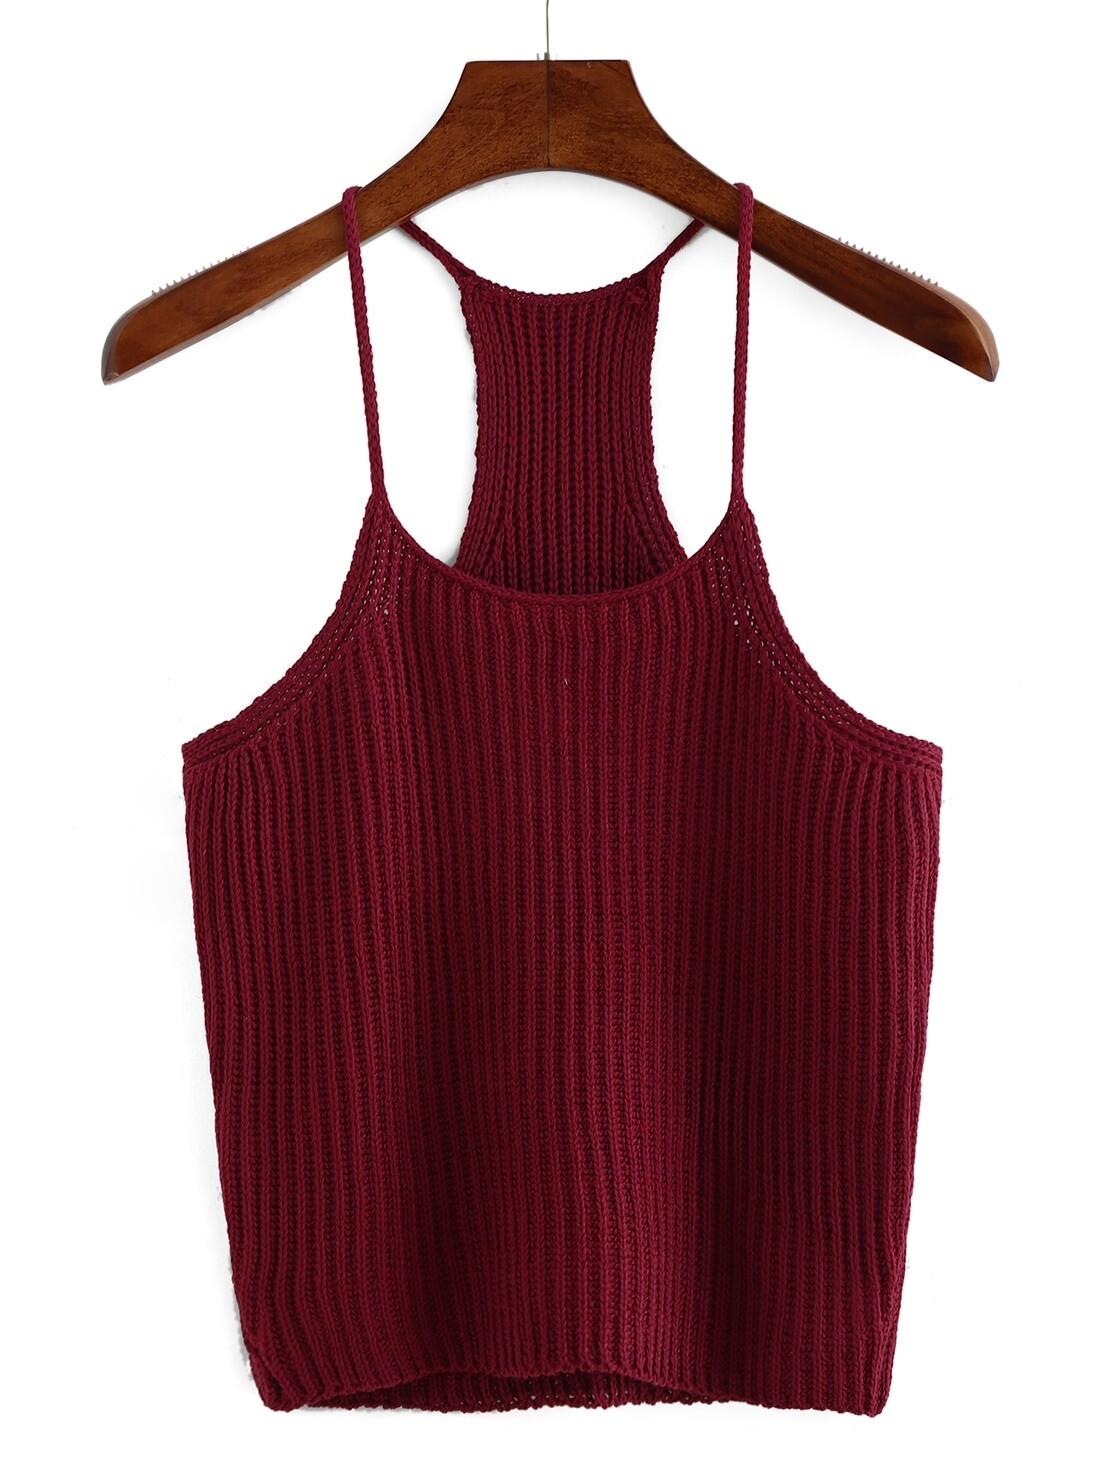 510d61dbab53a Burgundy Spaghetti Strap Knit Tank Top